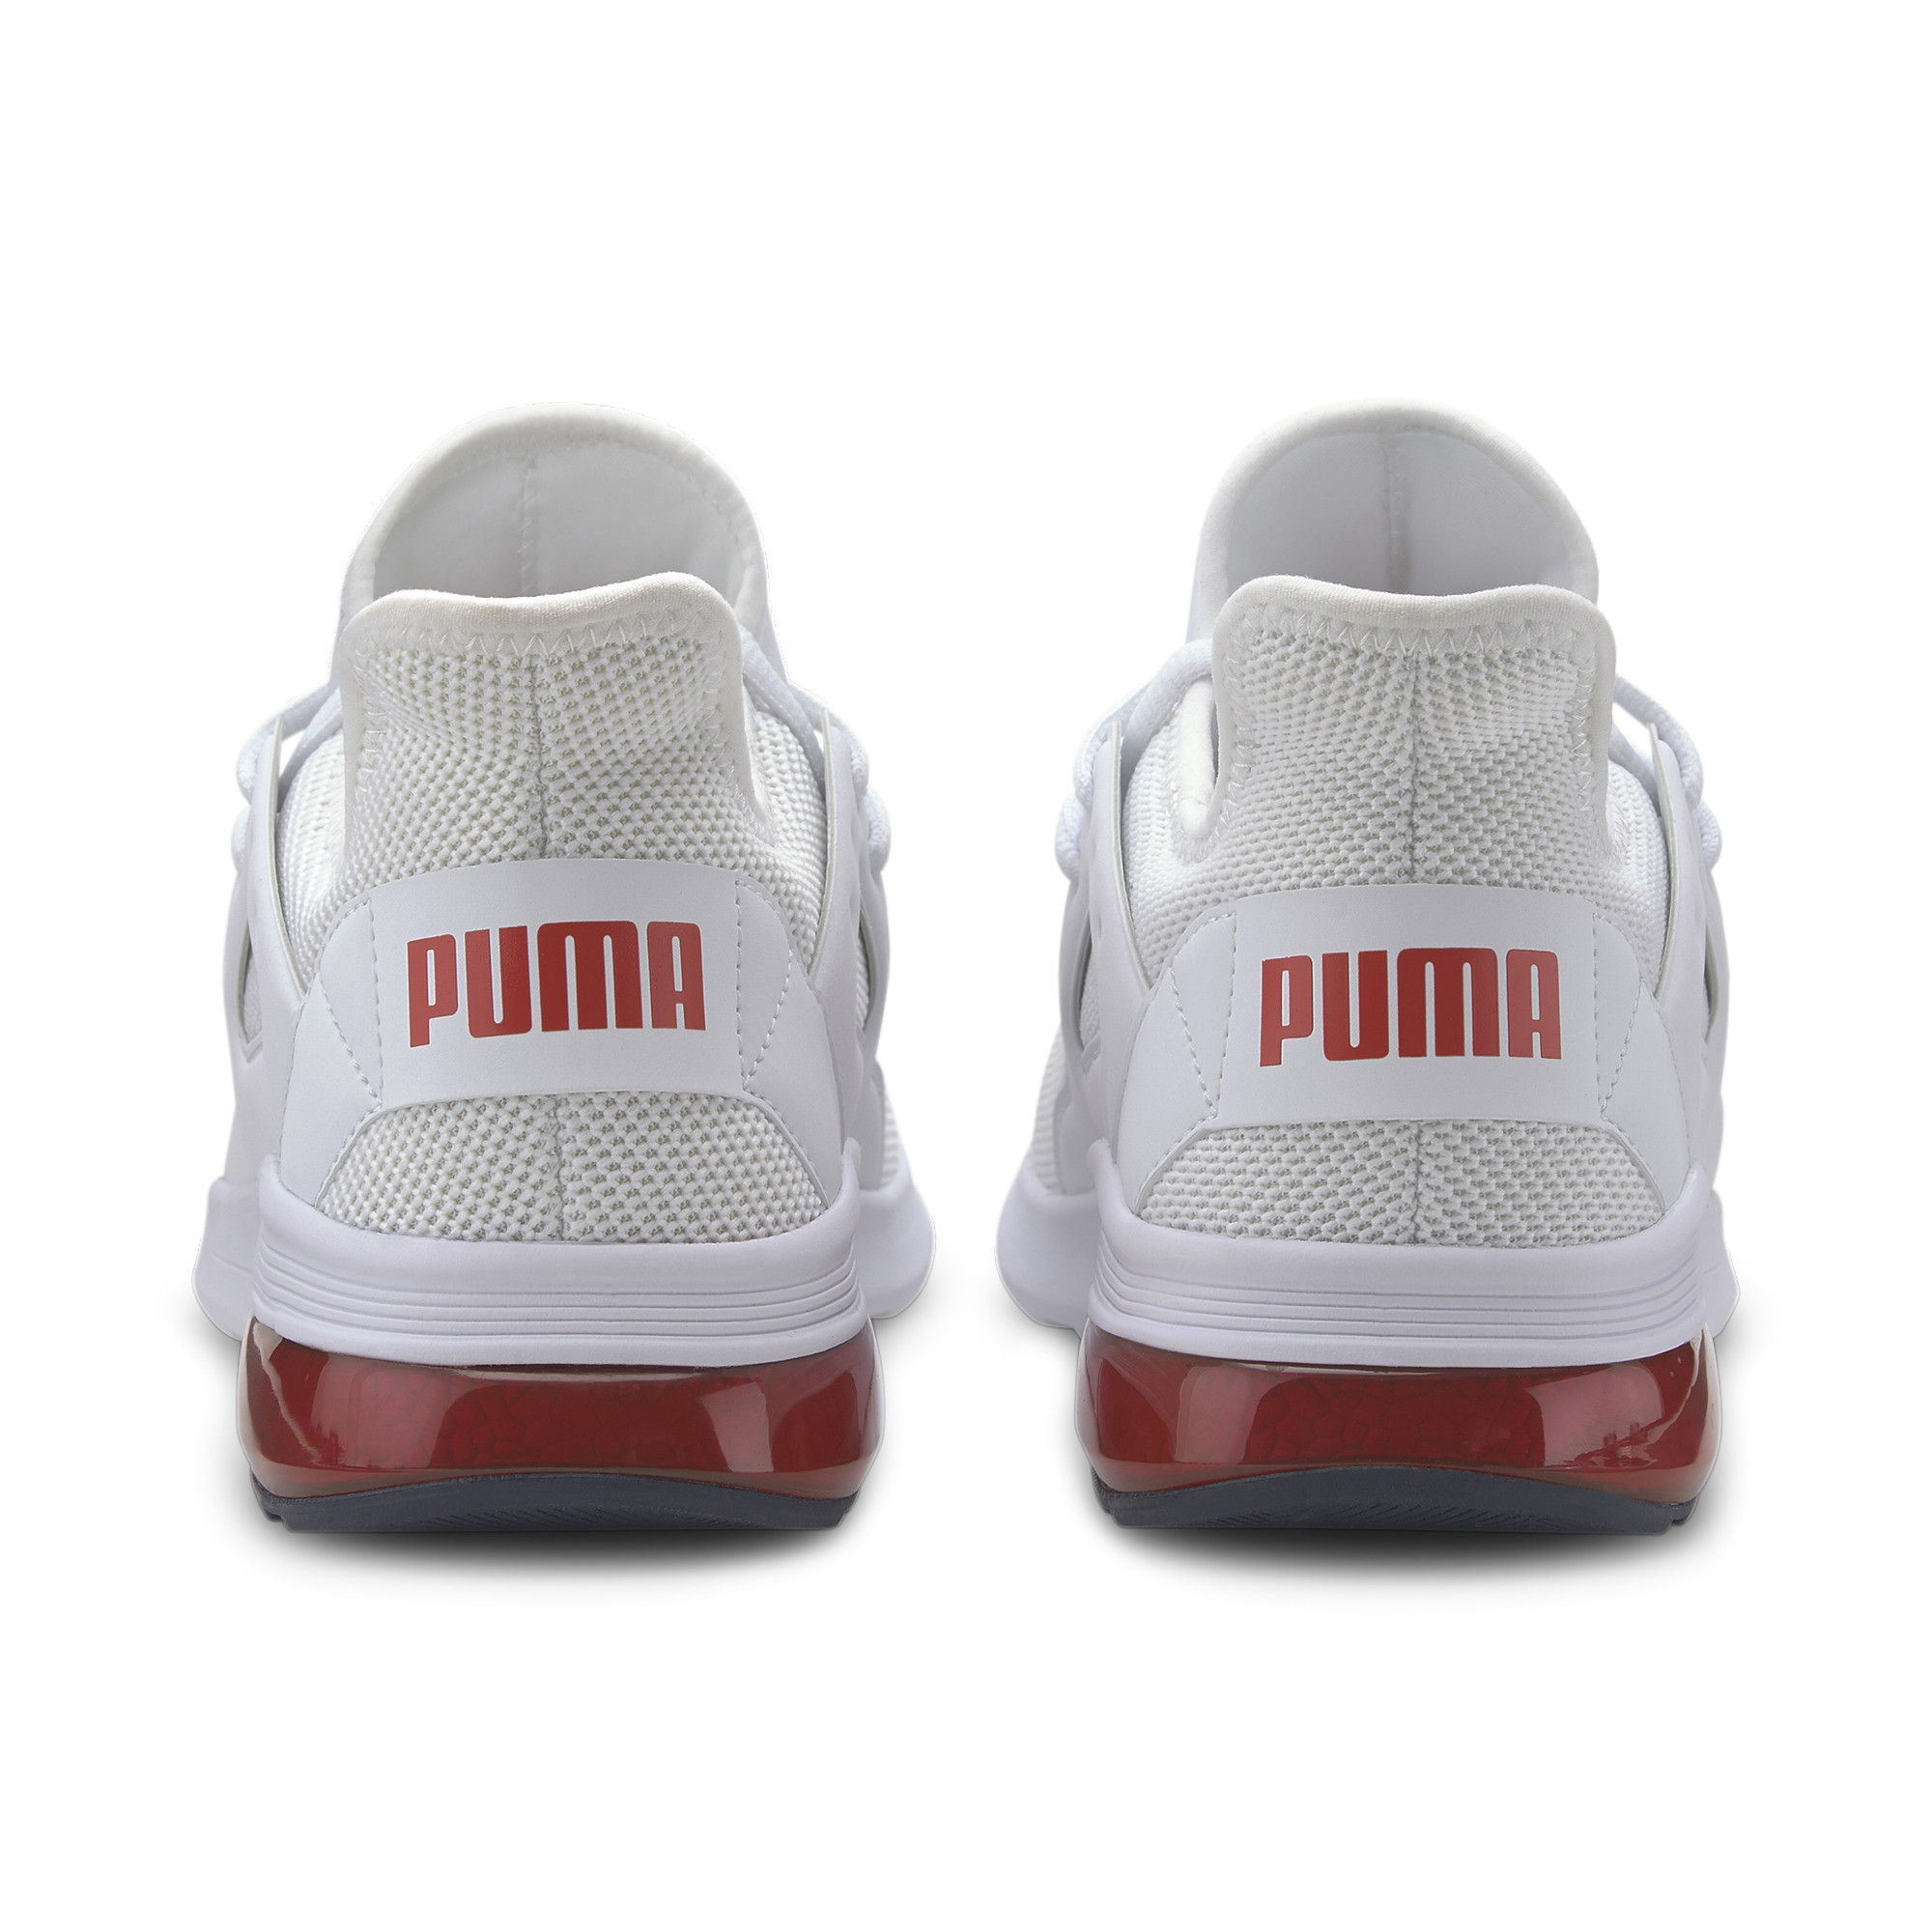 PUMA-Electron-Street-Men-039-s-Sneakers-Men-Shoe-Basics thumbnail 15